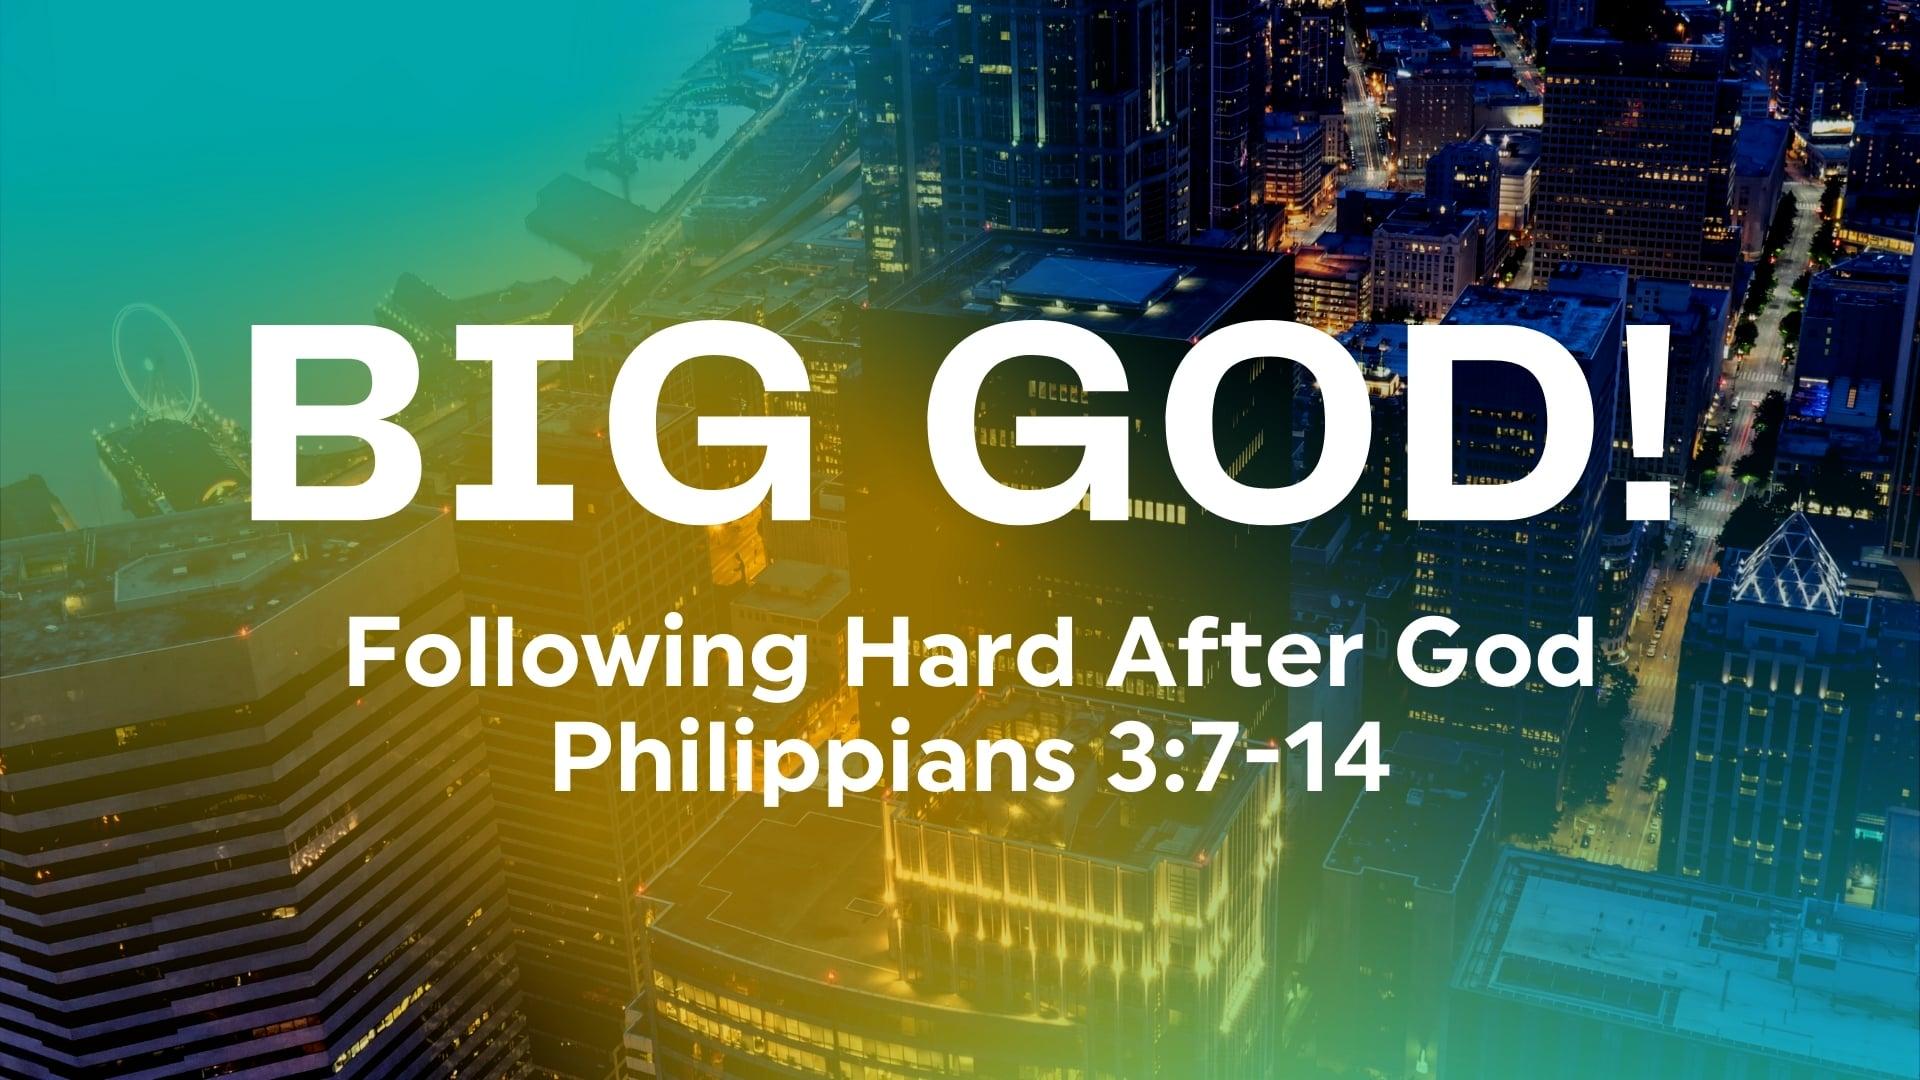 Following Hard After God - October 10, 2021